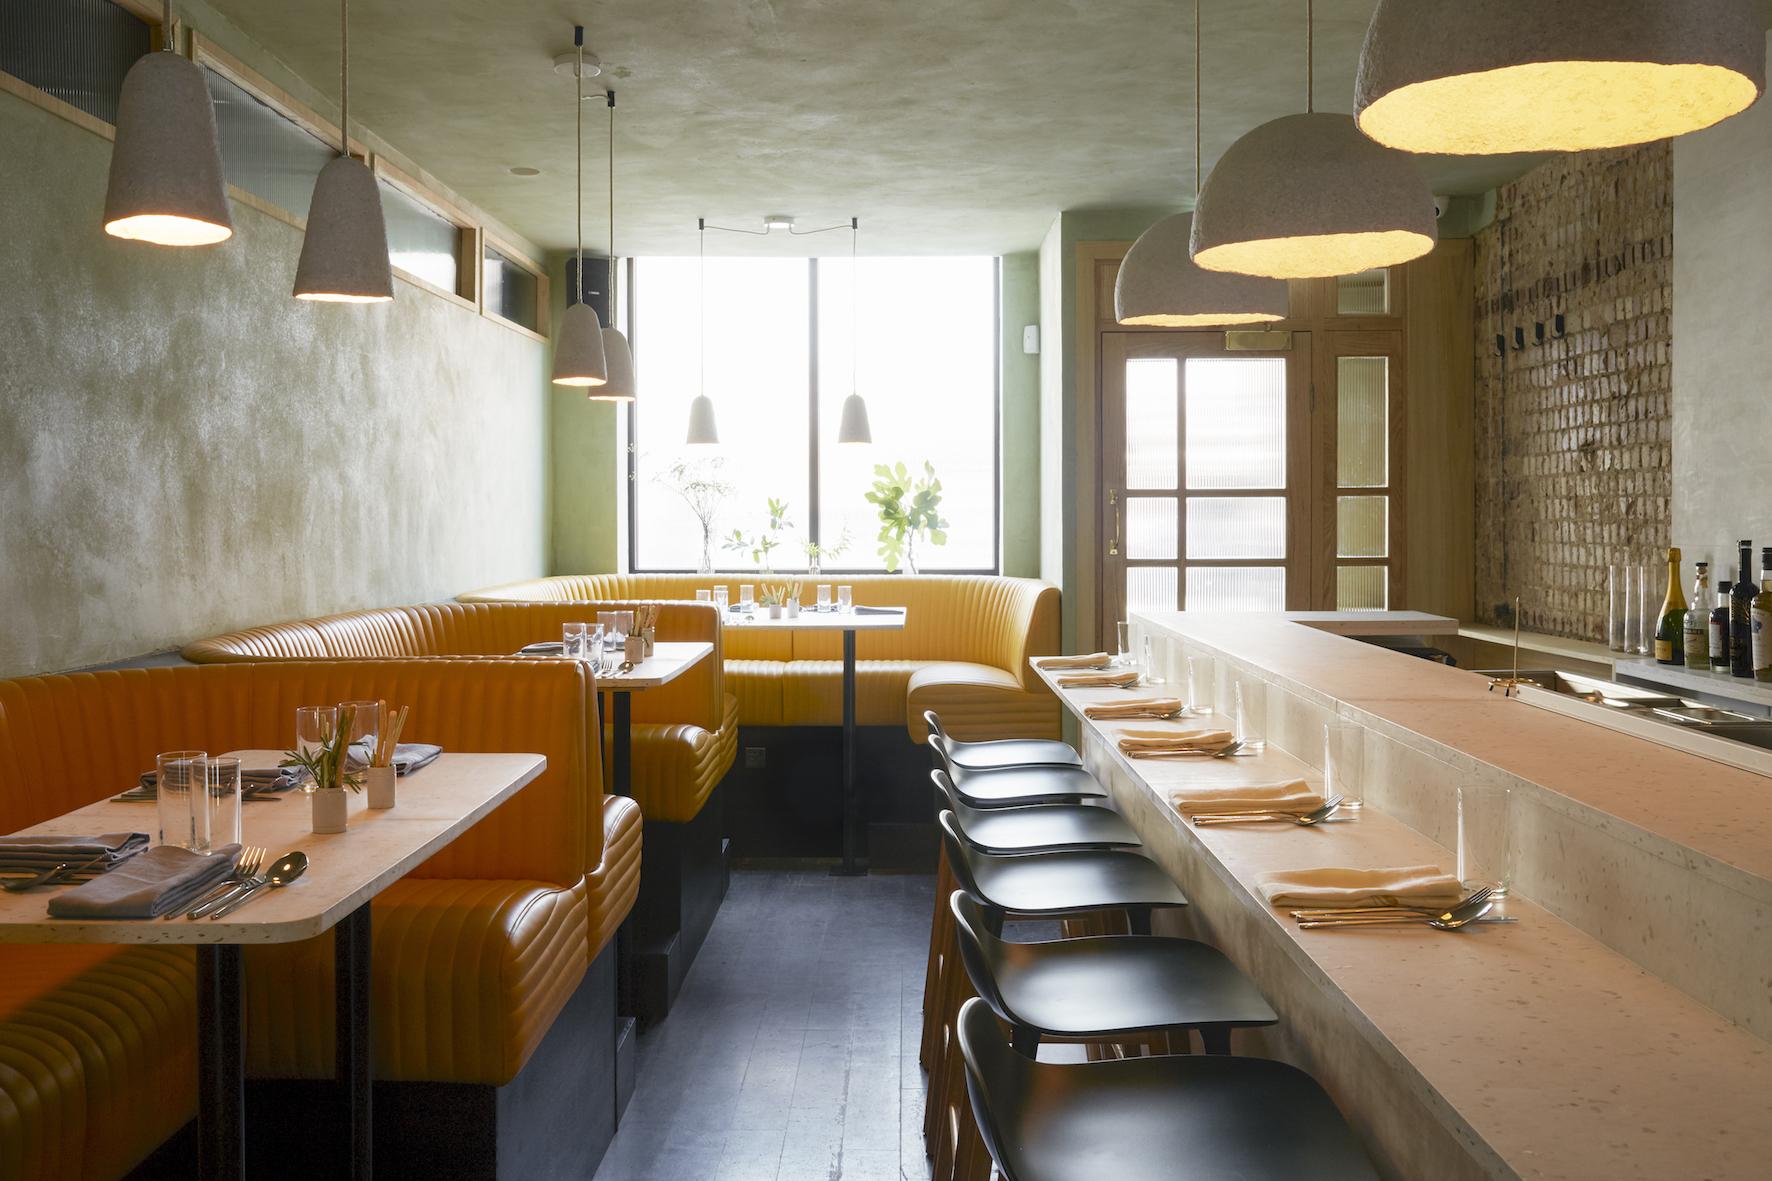 Cub restaurant, London